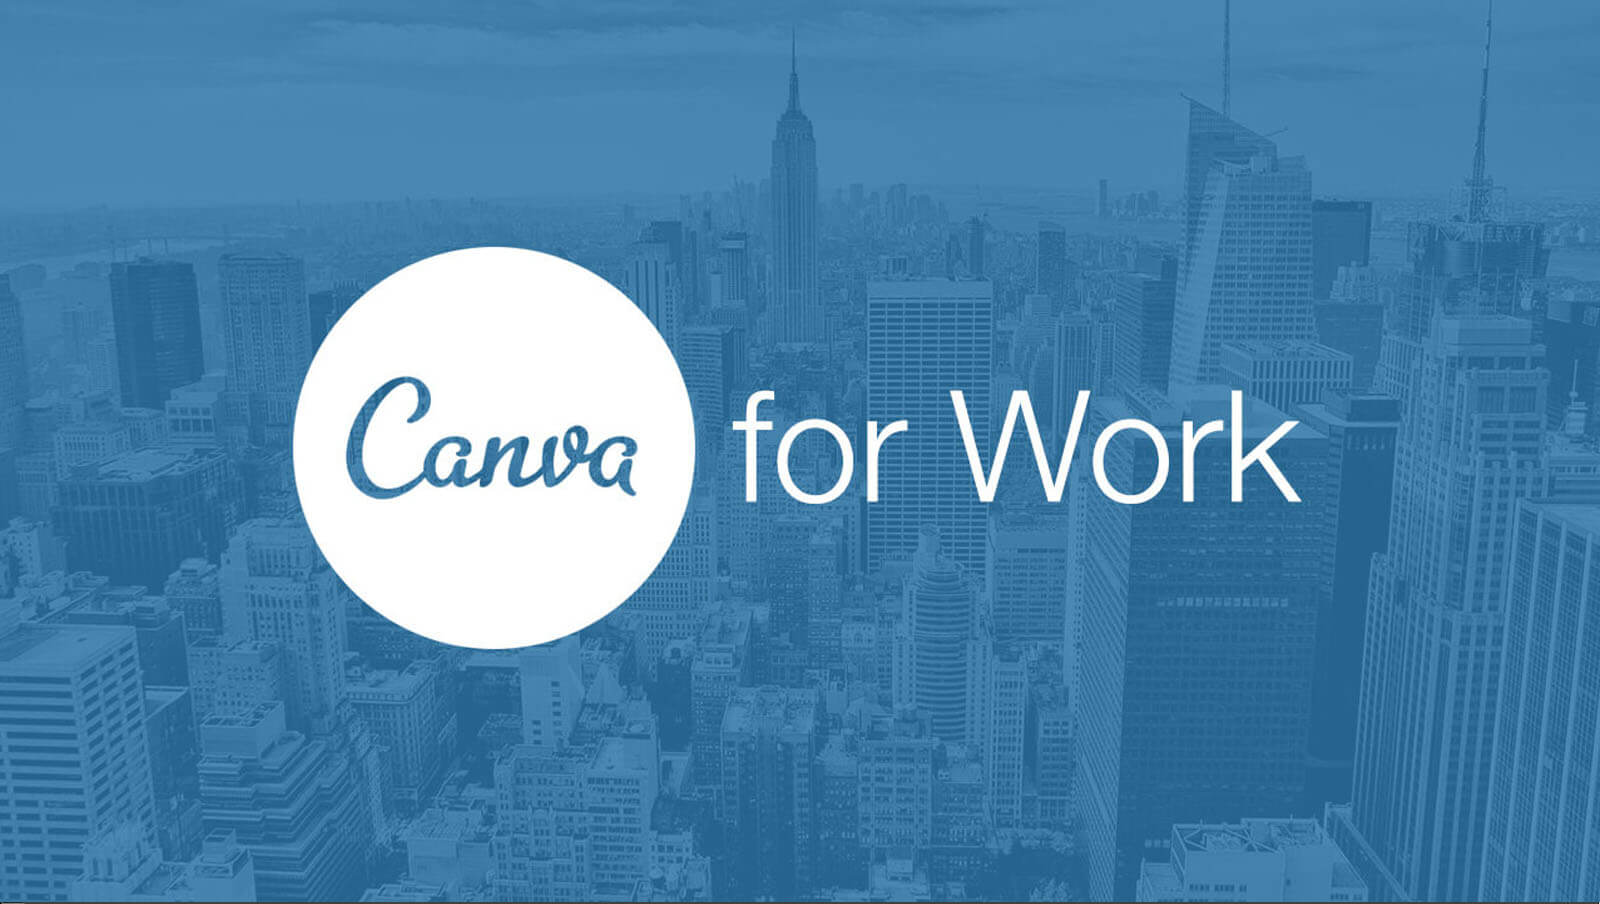 графический редактор Canva